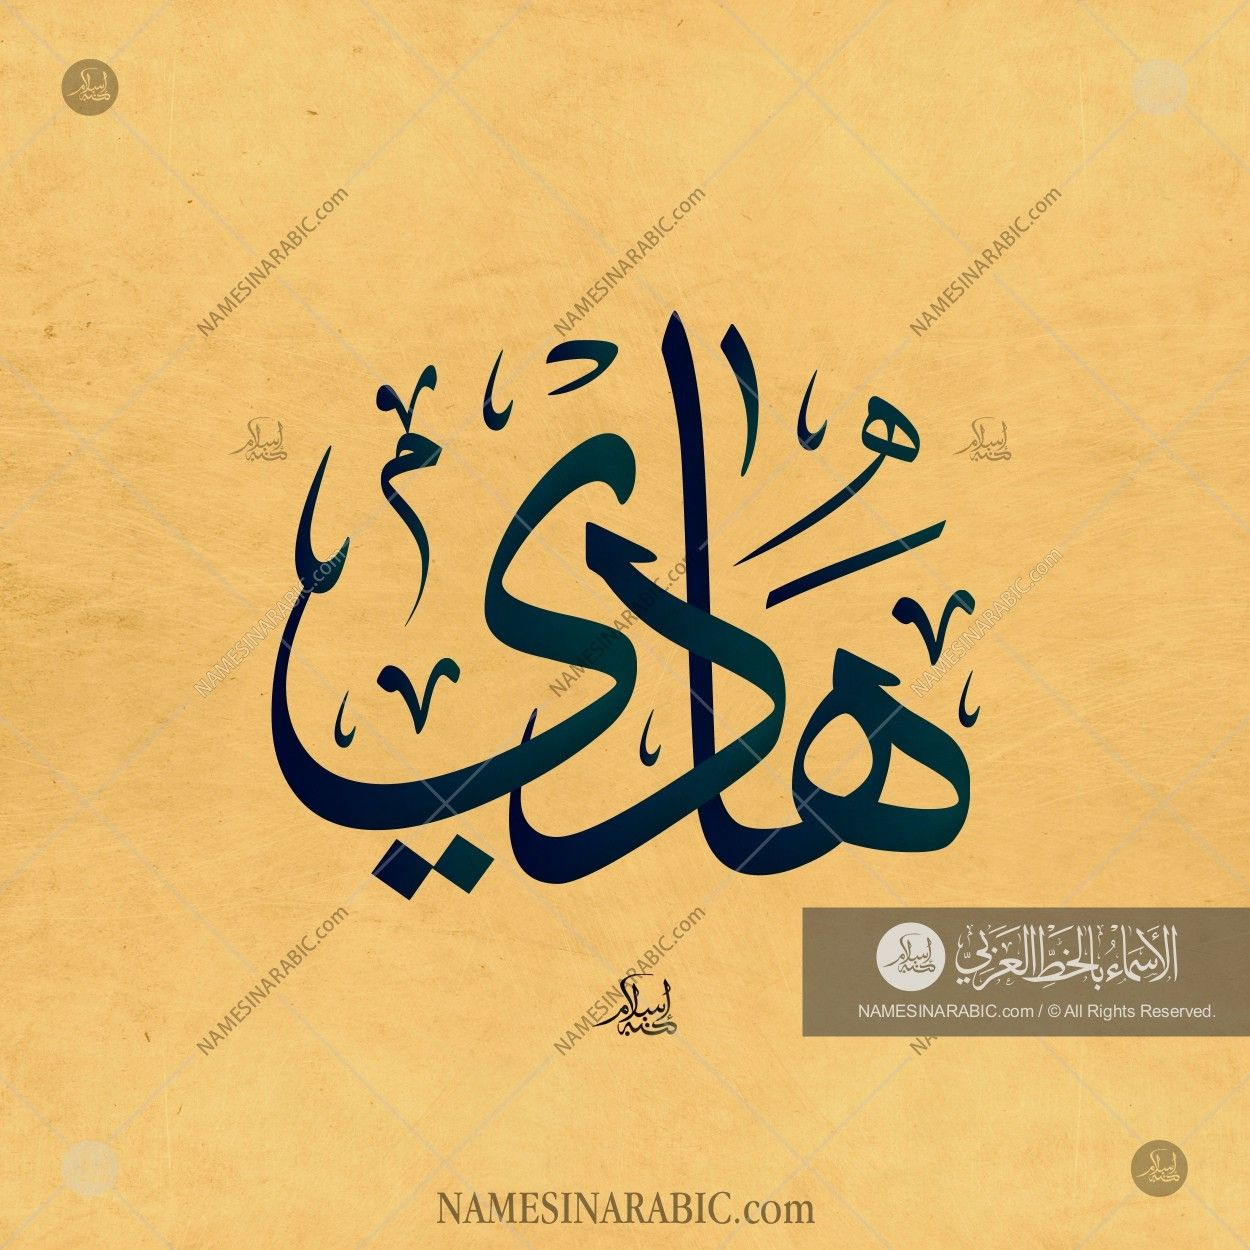 Hadi هادي Names In Arabic Calligraphy Name 6875 Calligraphy Name Calligraphy Names